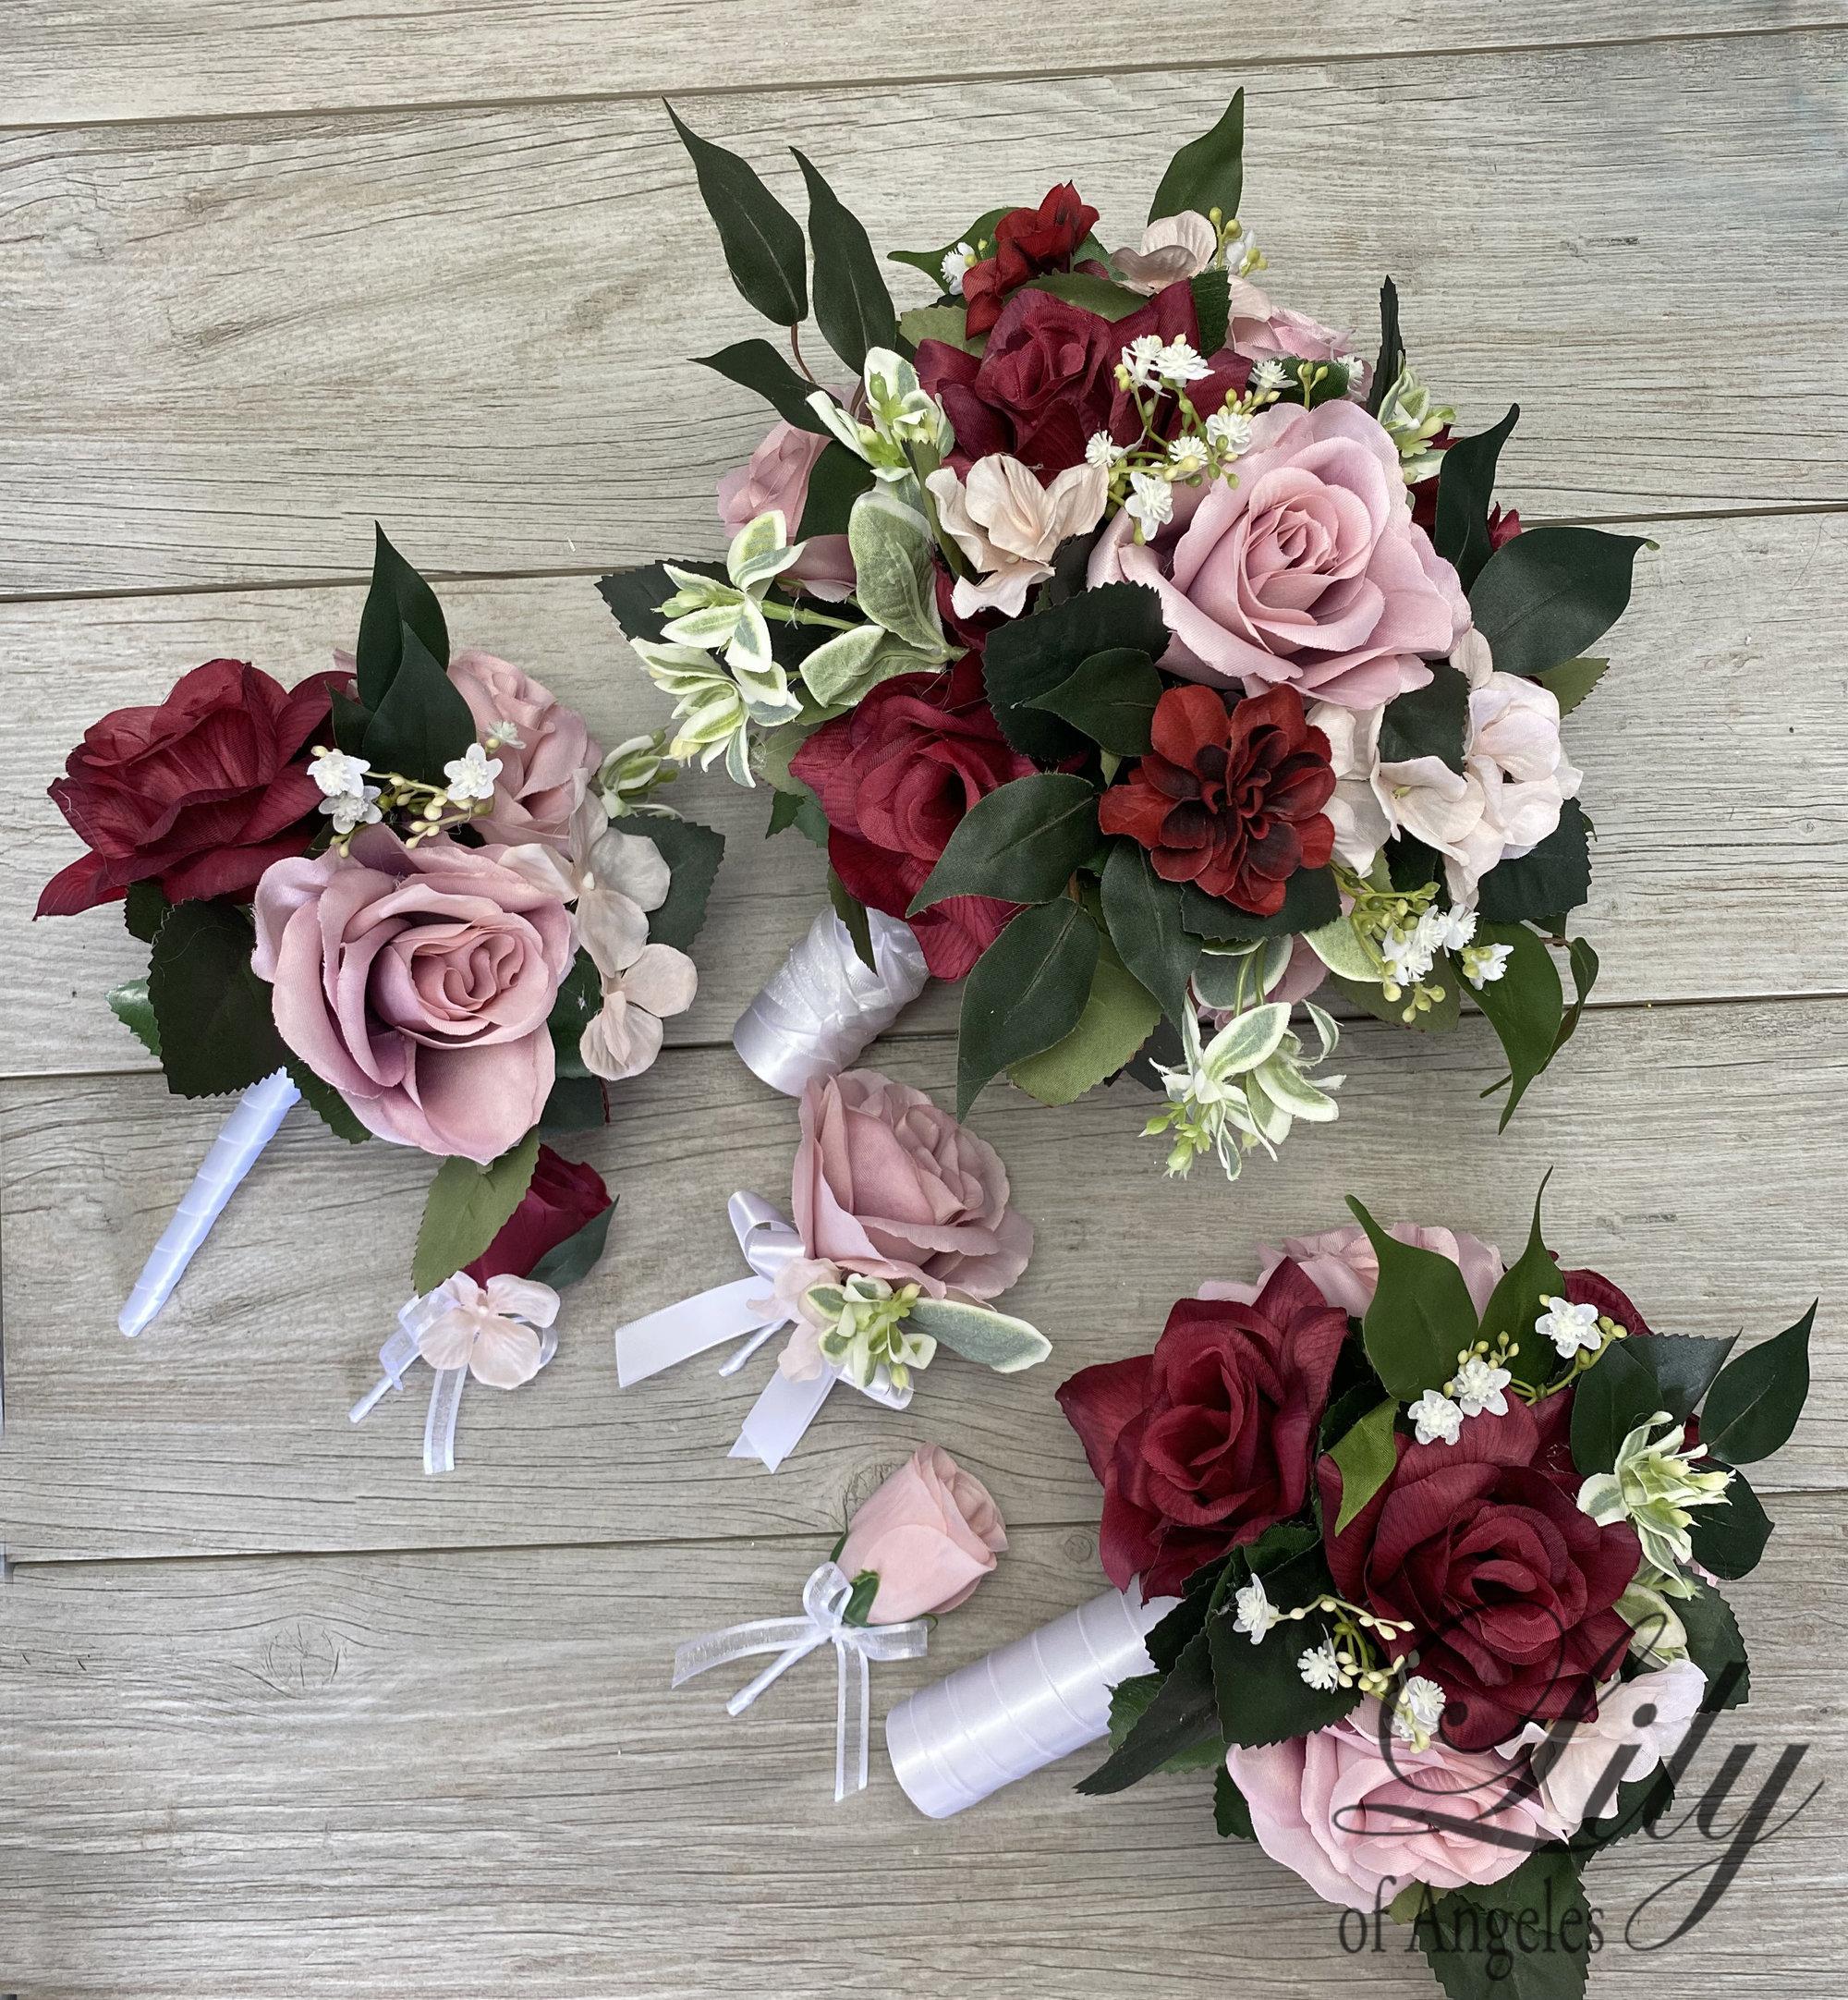 Coral Bridal Bouquet Wedding Flowers Silk Flower Bouquet 17 Piece Package Bridesmaid Bouquet Lily Of Angeles Wedding Bouquet Orange